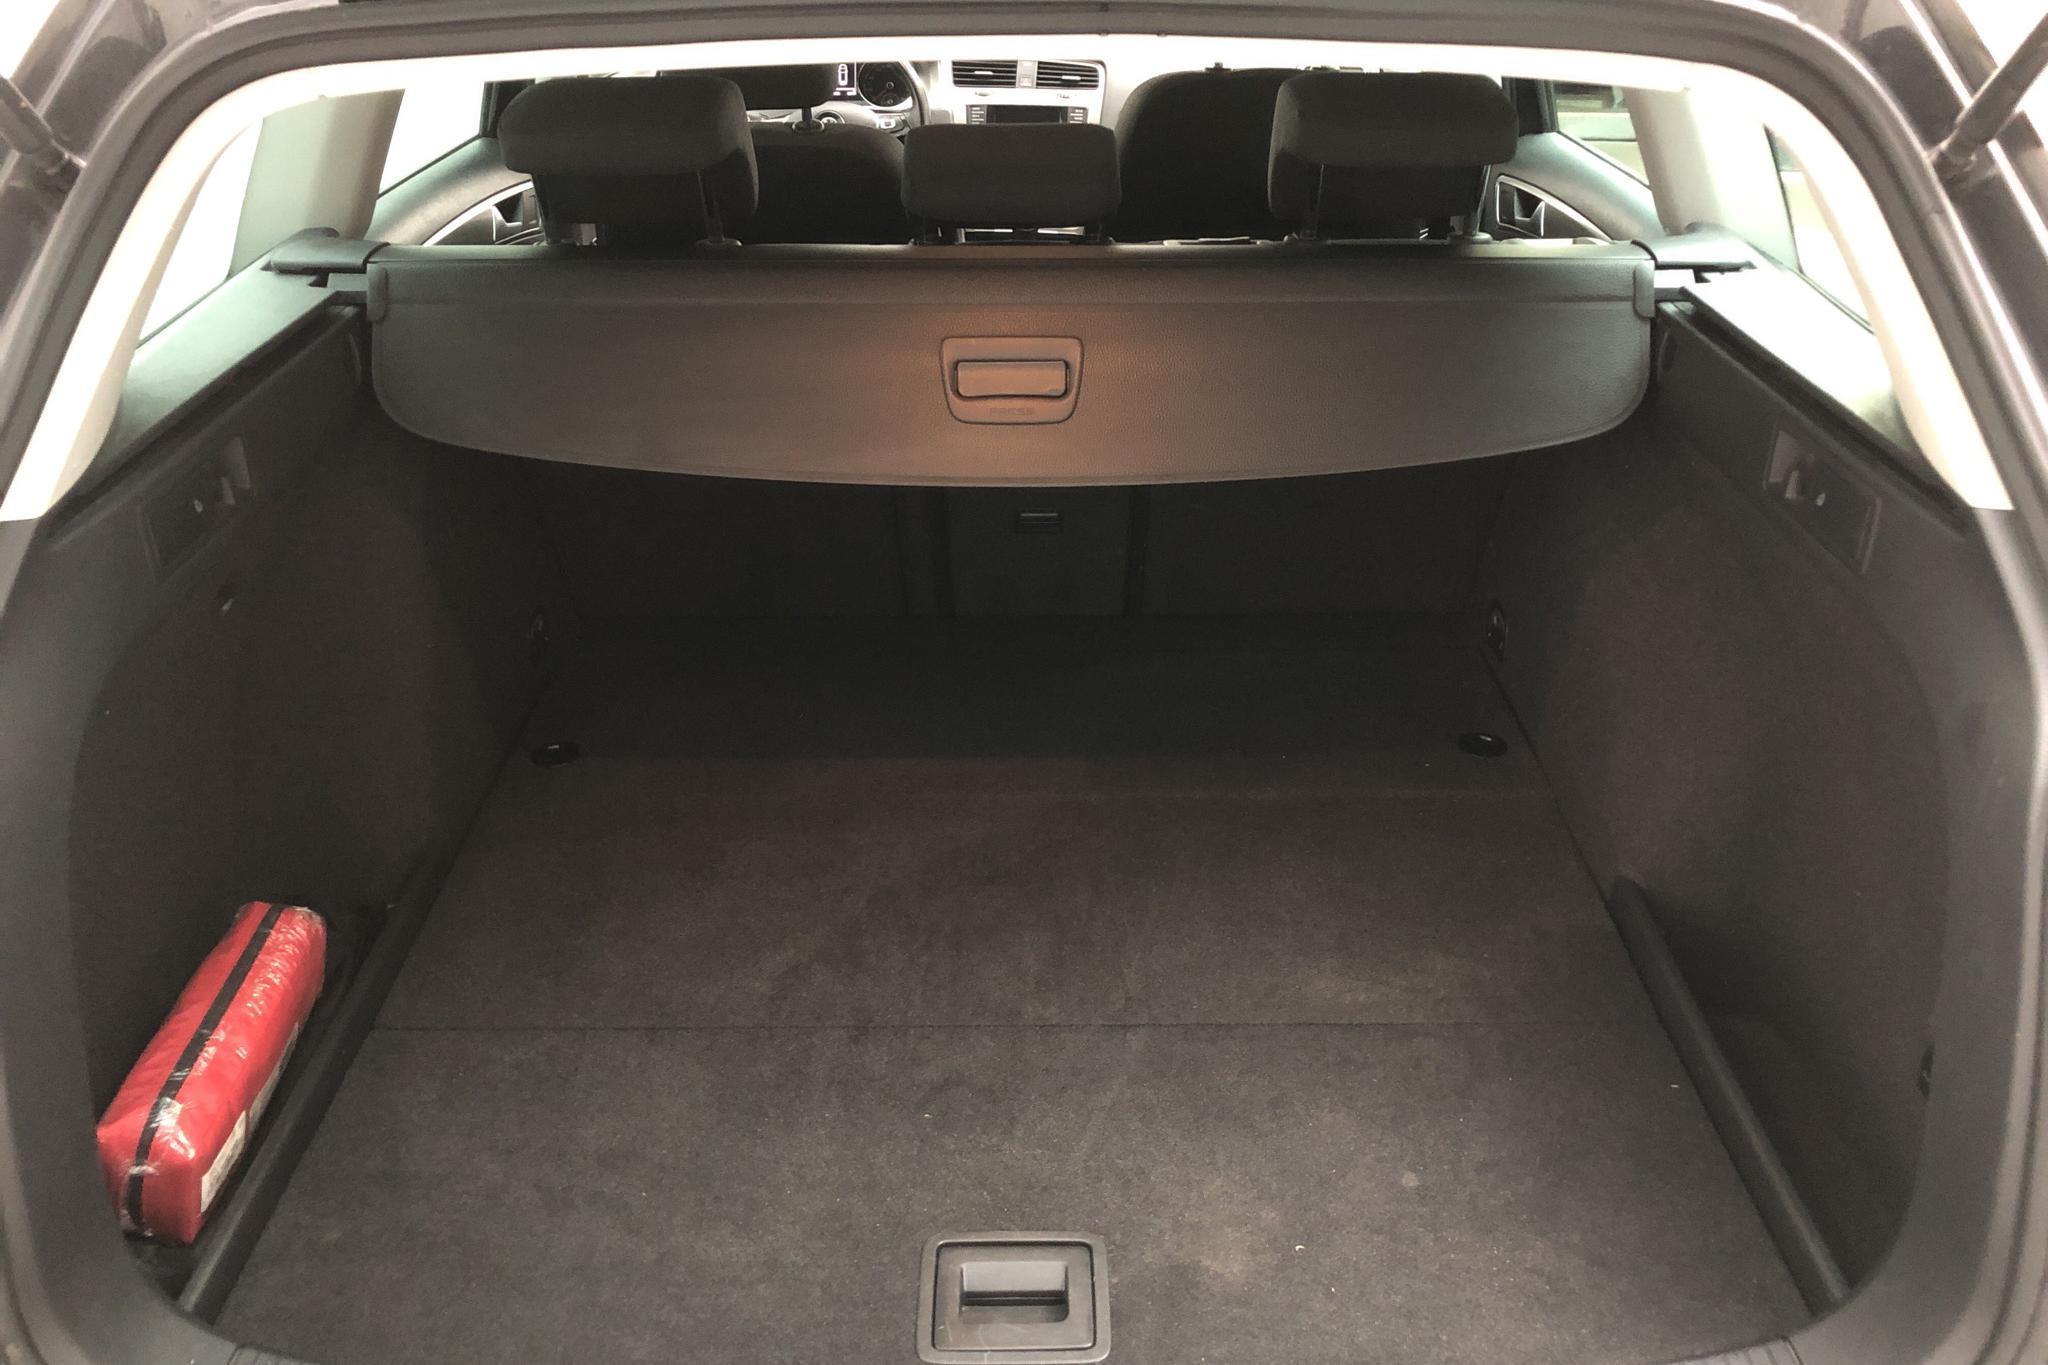 VW Golf VII 1.6 TDI BlueMotion Technology Sportscombi (105hk) - 141 280 km - Manual - Dark Grey - 2014